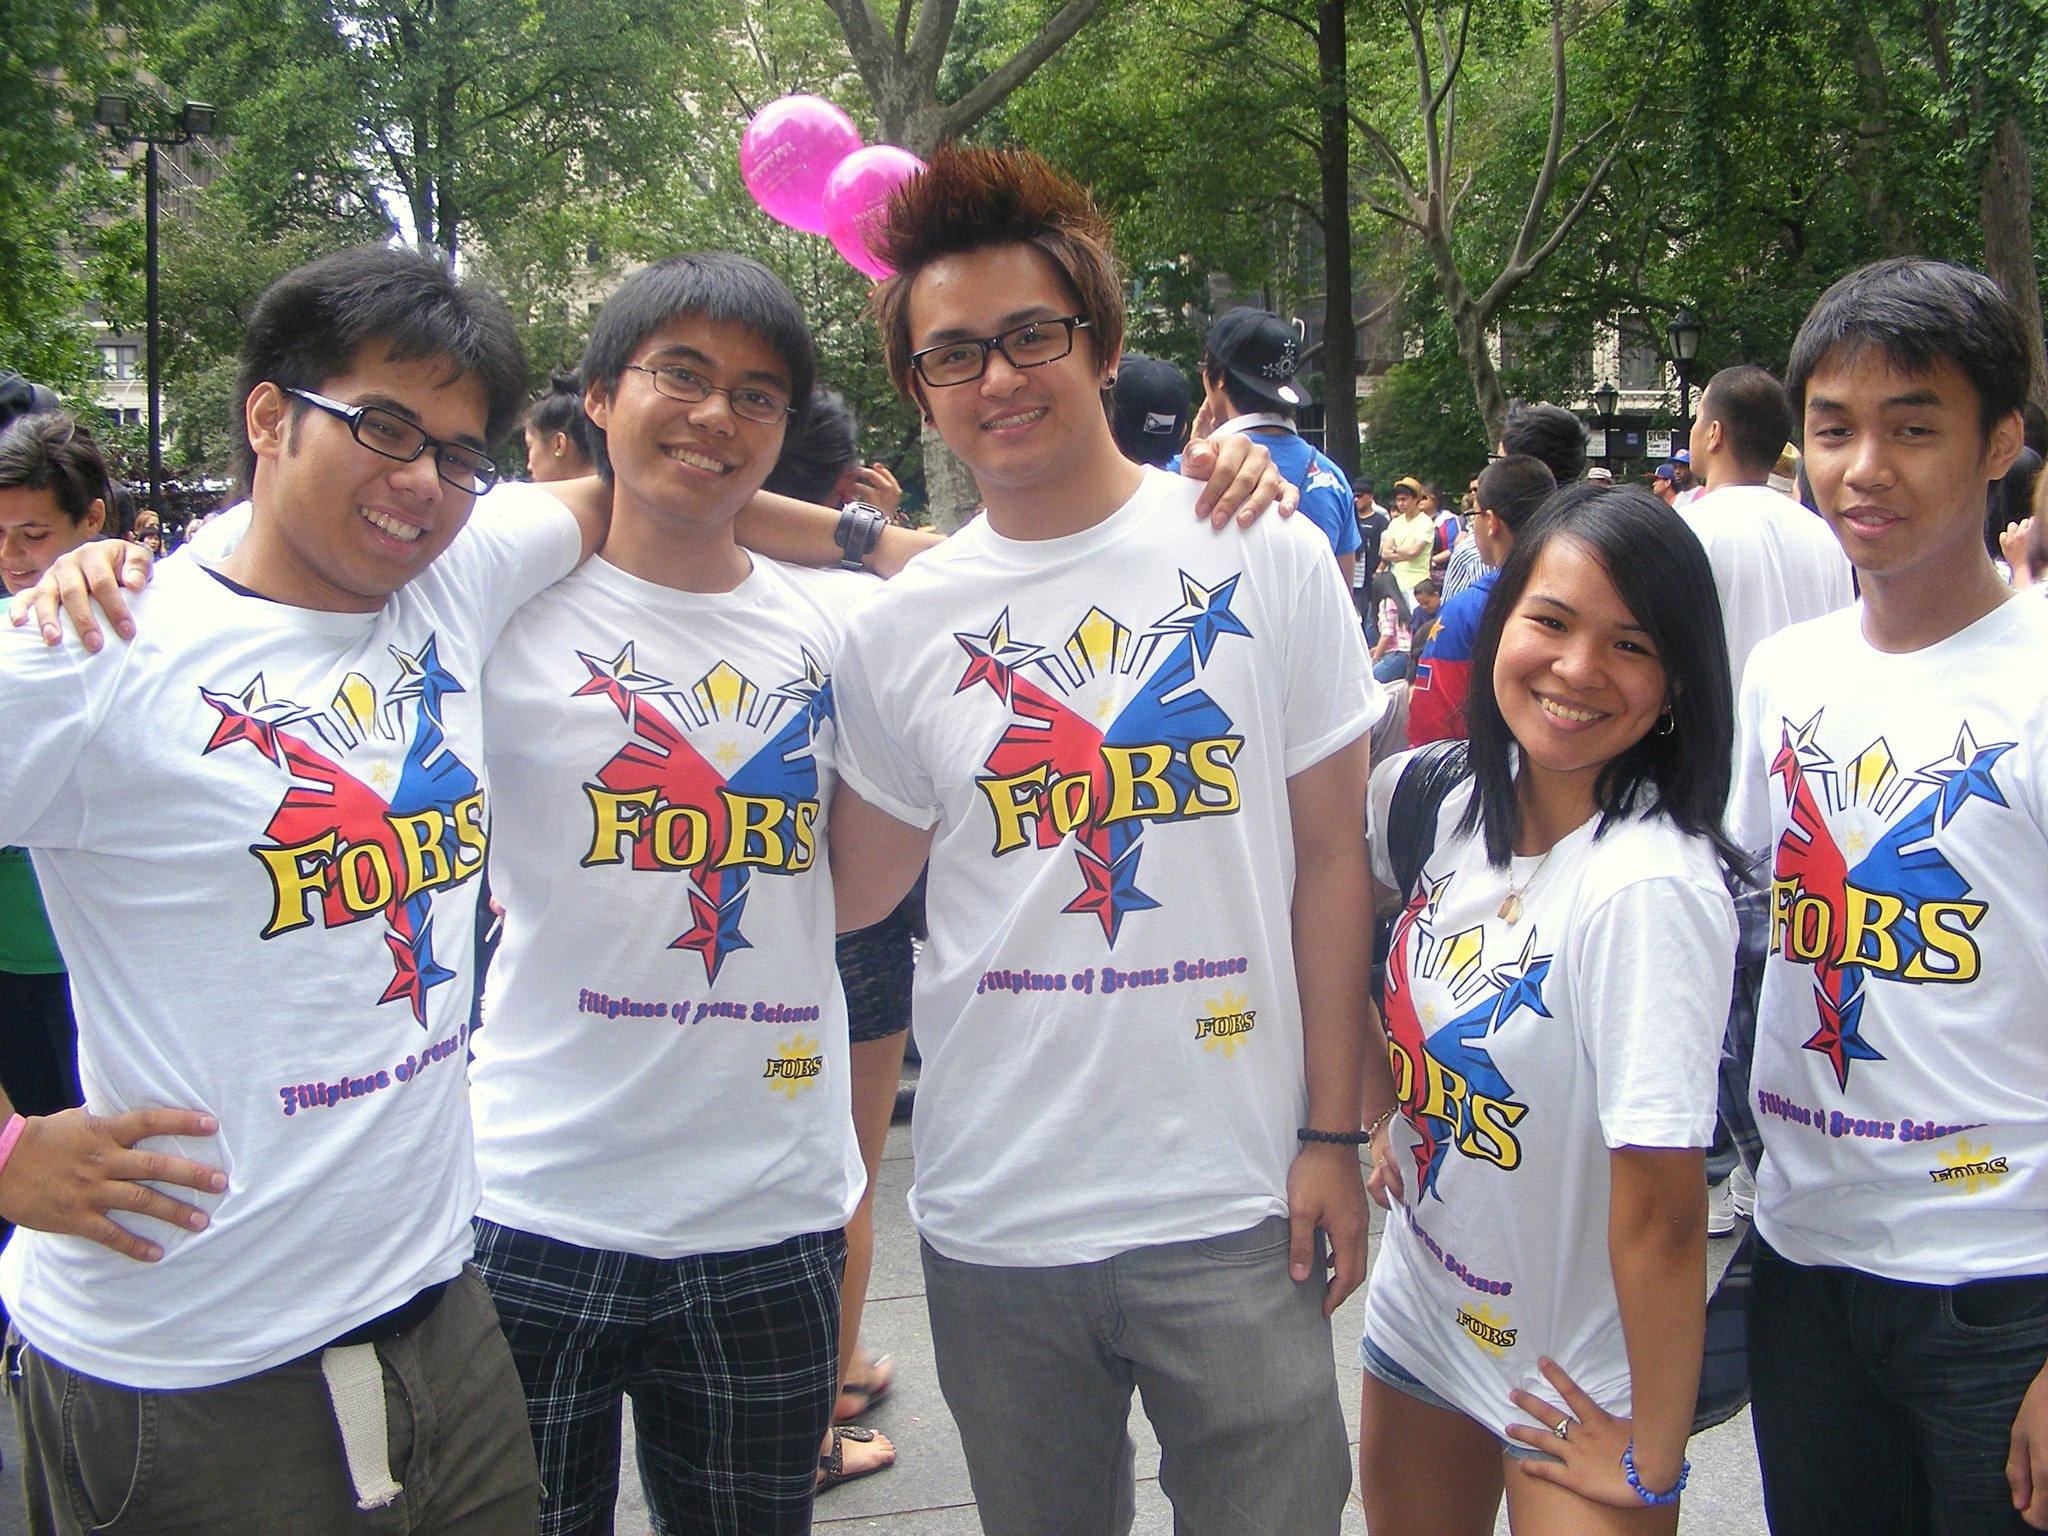 Design t shirt for group - Fo Bs At Filipino Day Parade T Shirt Photo